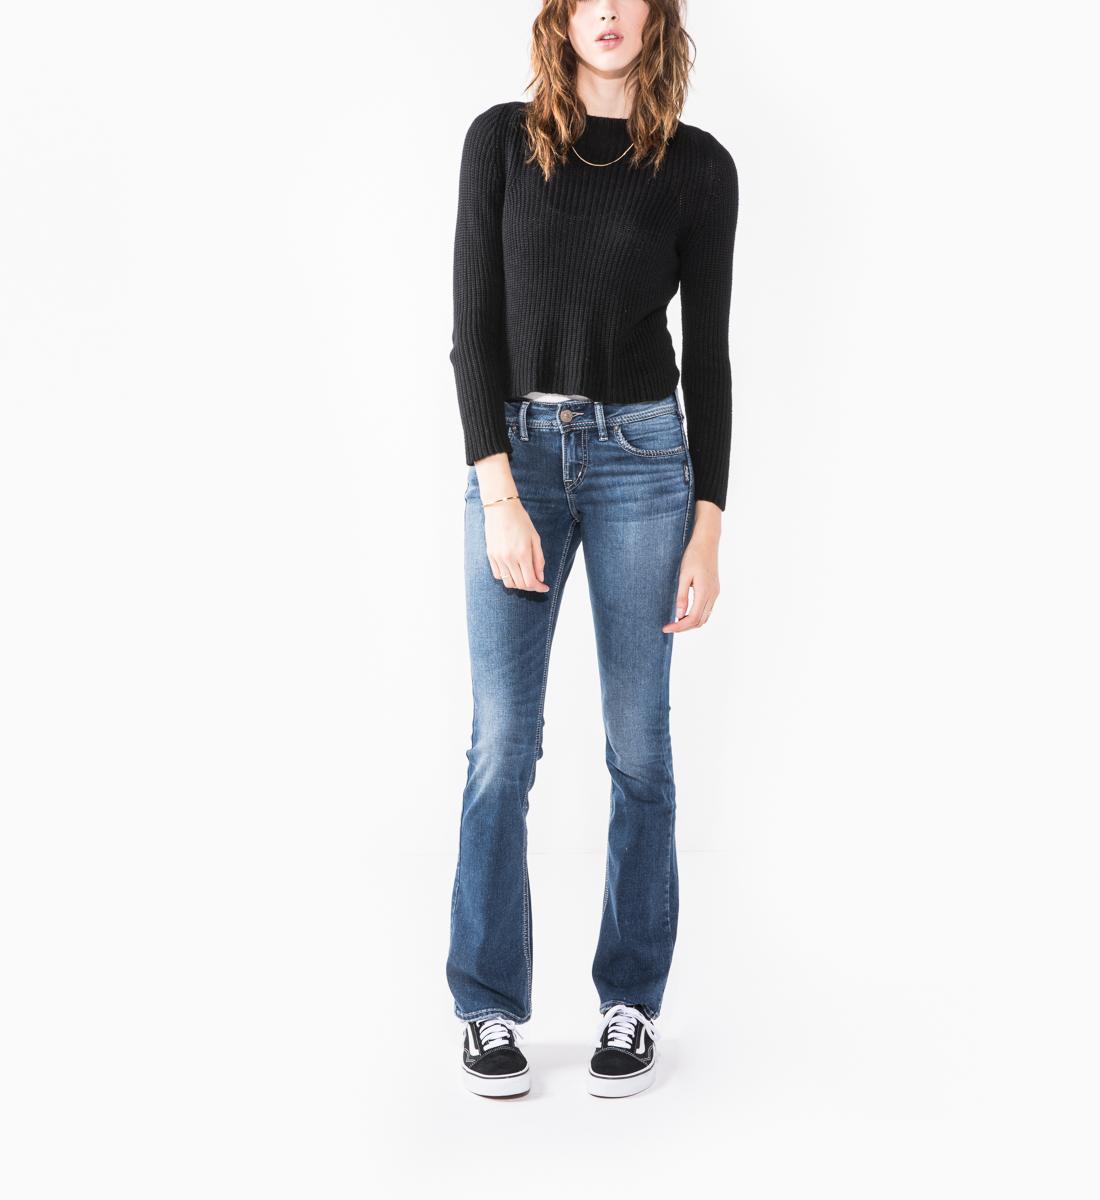 a659e3a5 Elyse Mid Rise Slim Bootcut Jeans, , hi-res